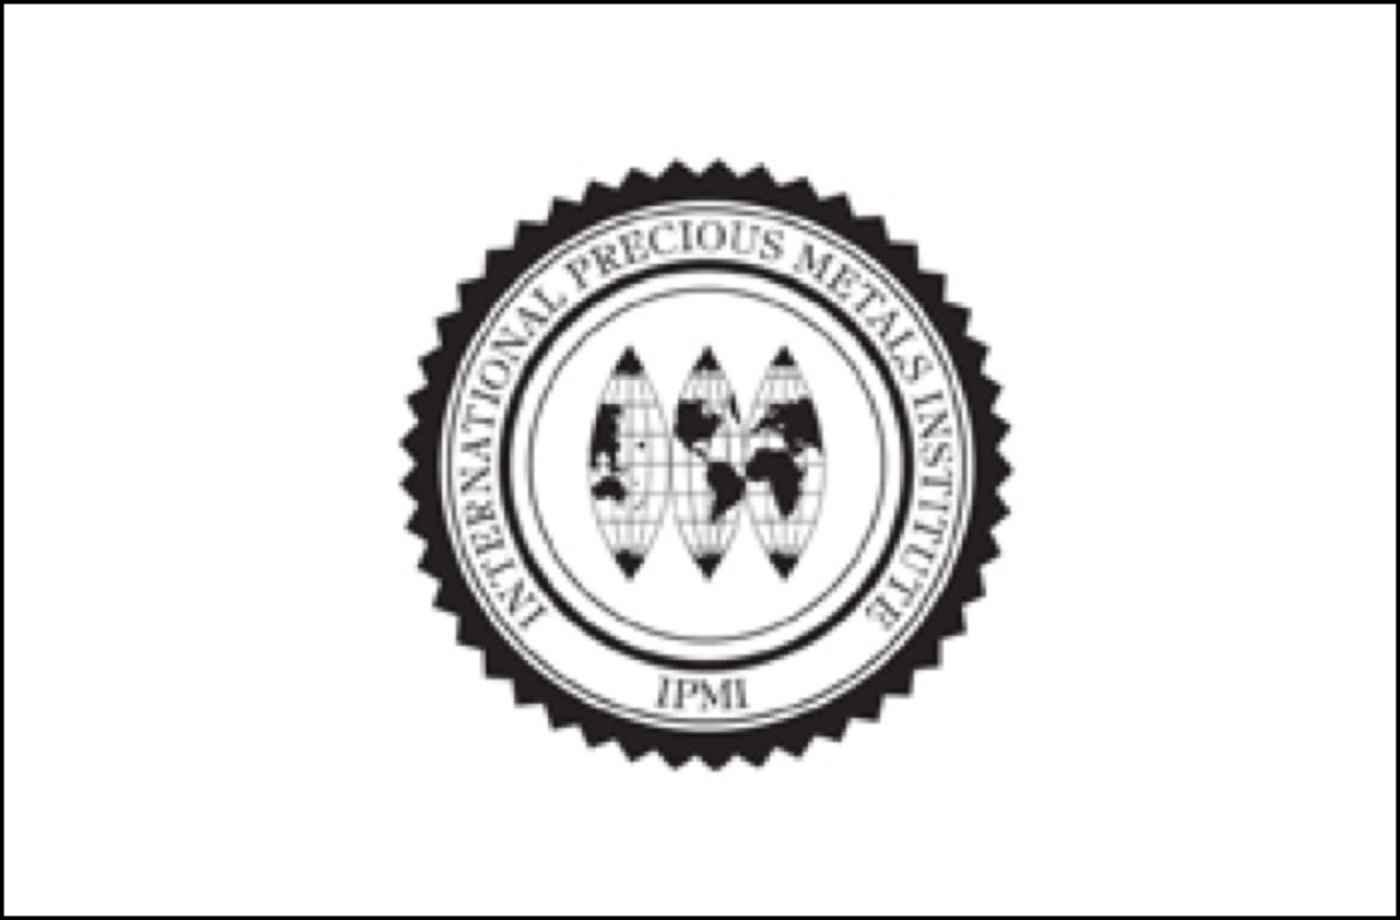 mairec edelmetall precious metal recycling mitgliedschaft ipme international precious metals institute membership